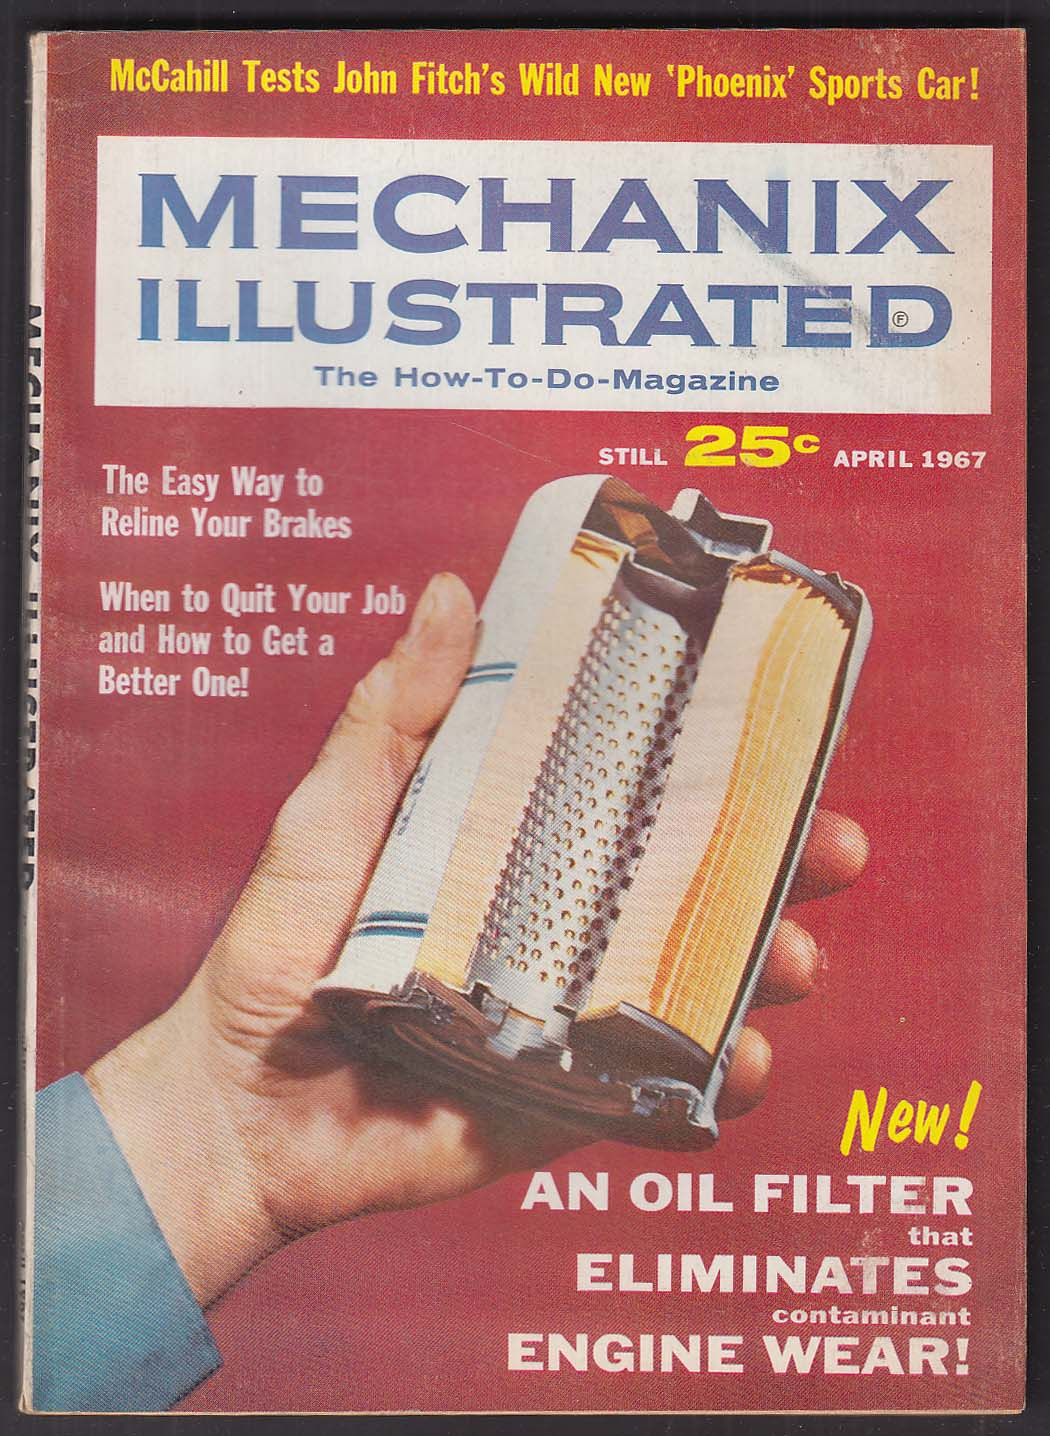 Fitch Phoenix : fitch, phoenix, MECHANIX, ILLUSTRATED, Fitch, Phoenix, Oldsmobile, Delmont, Tests